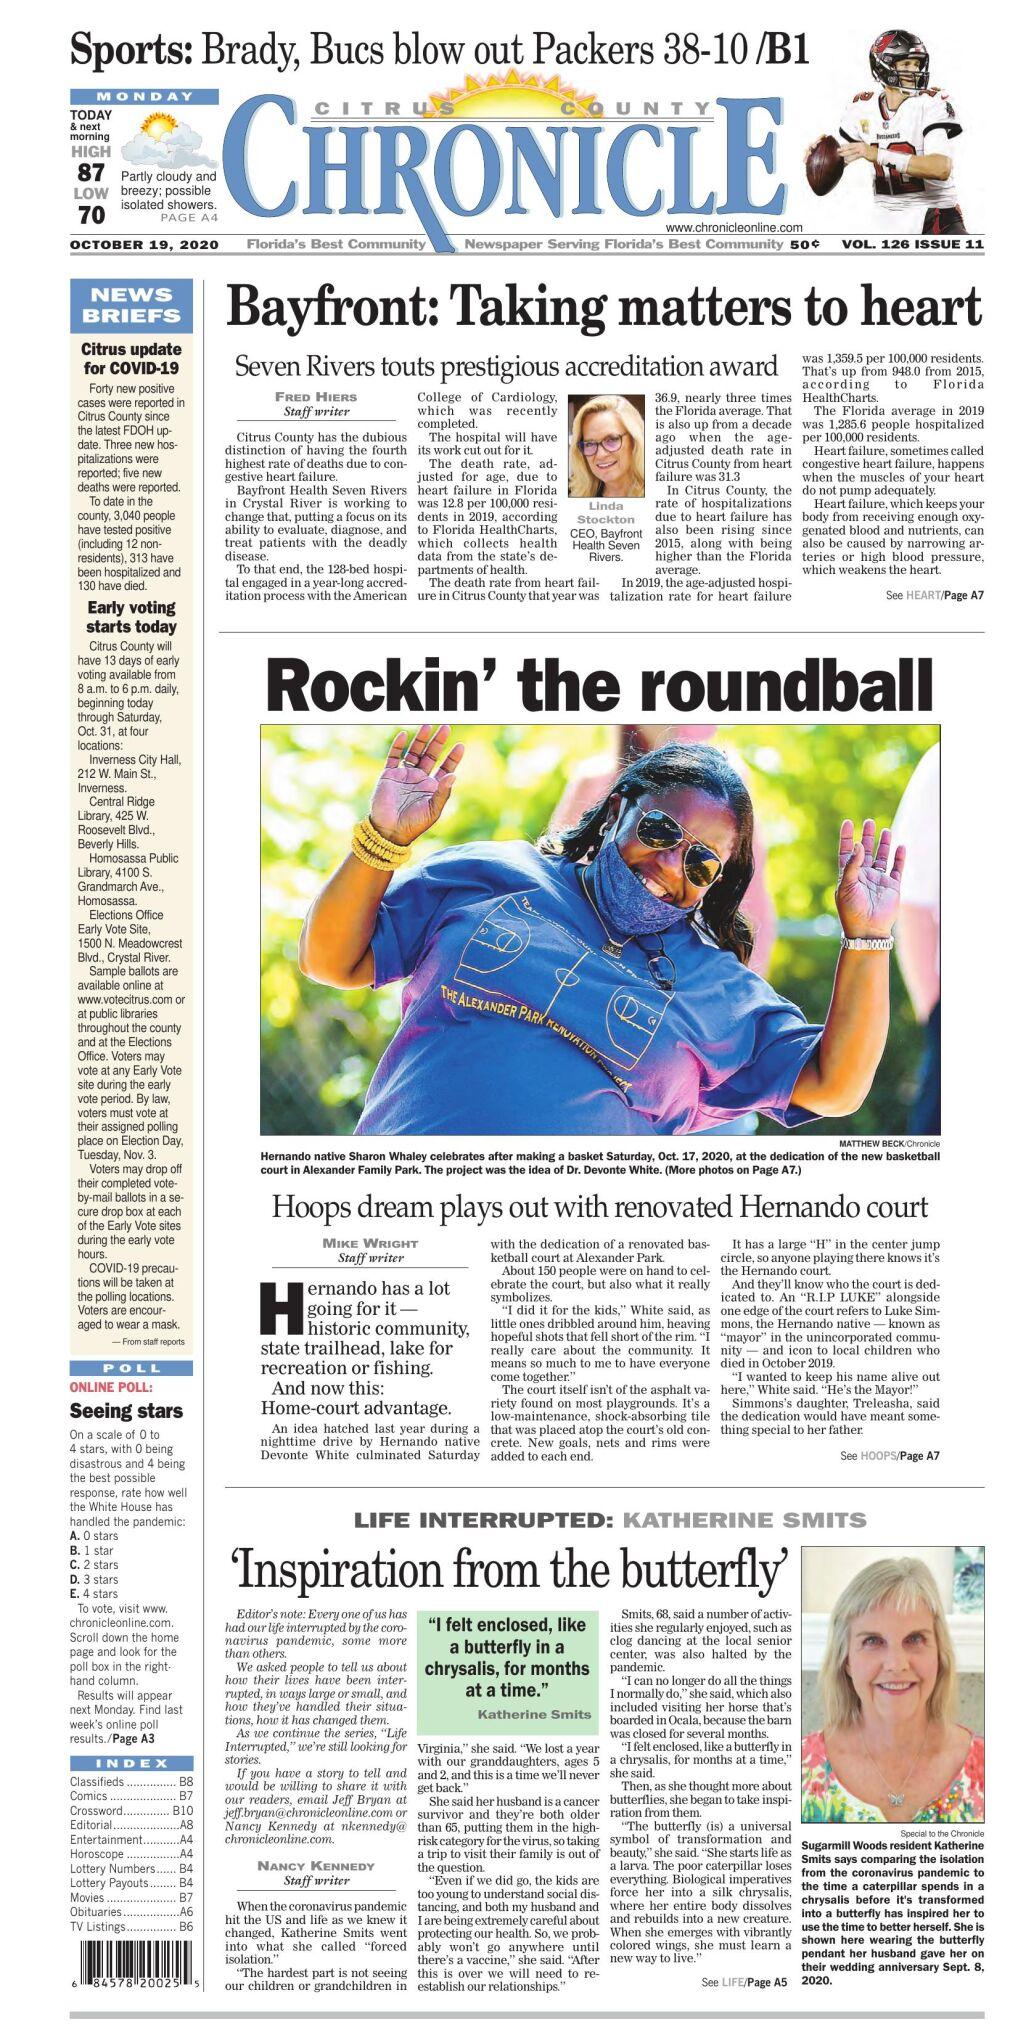 Christmas Show Citrus County Fl 2020 Citrus County Chronicle Oct 19, 2020 e edition | E edition